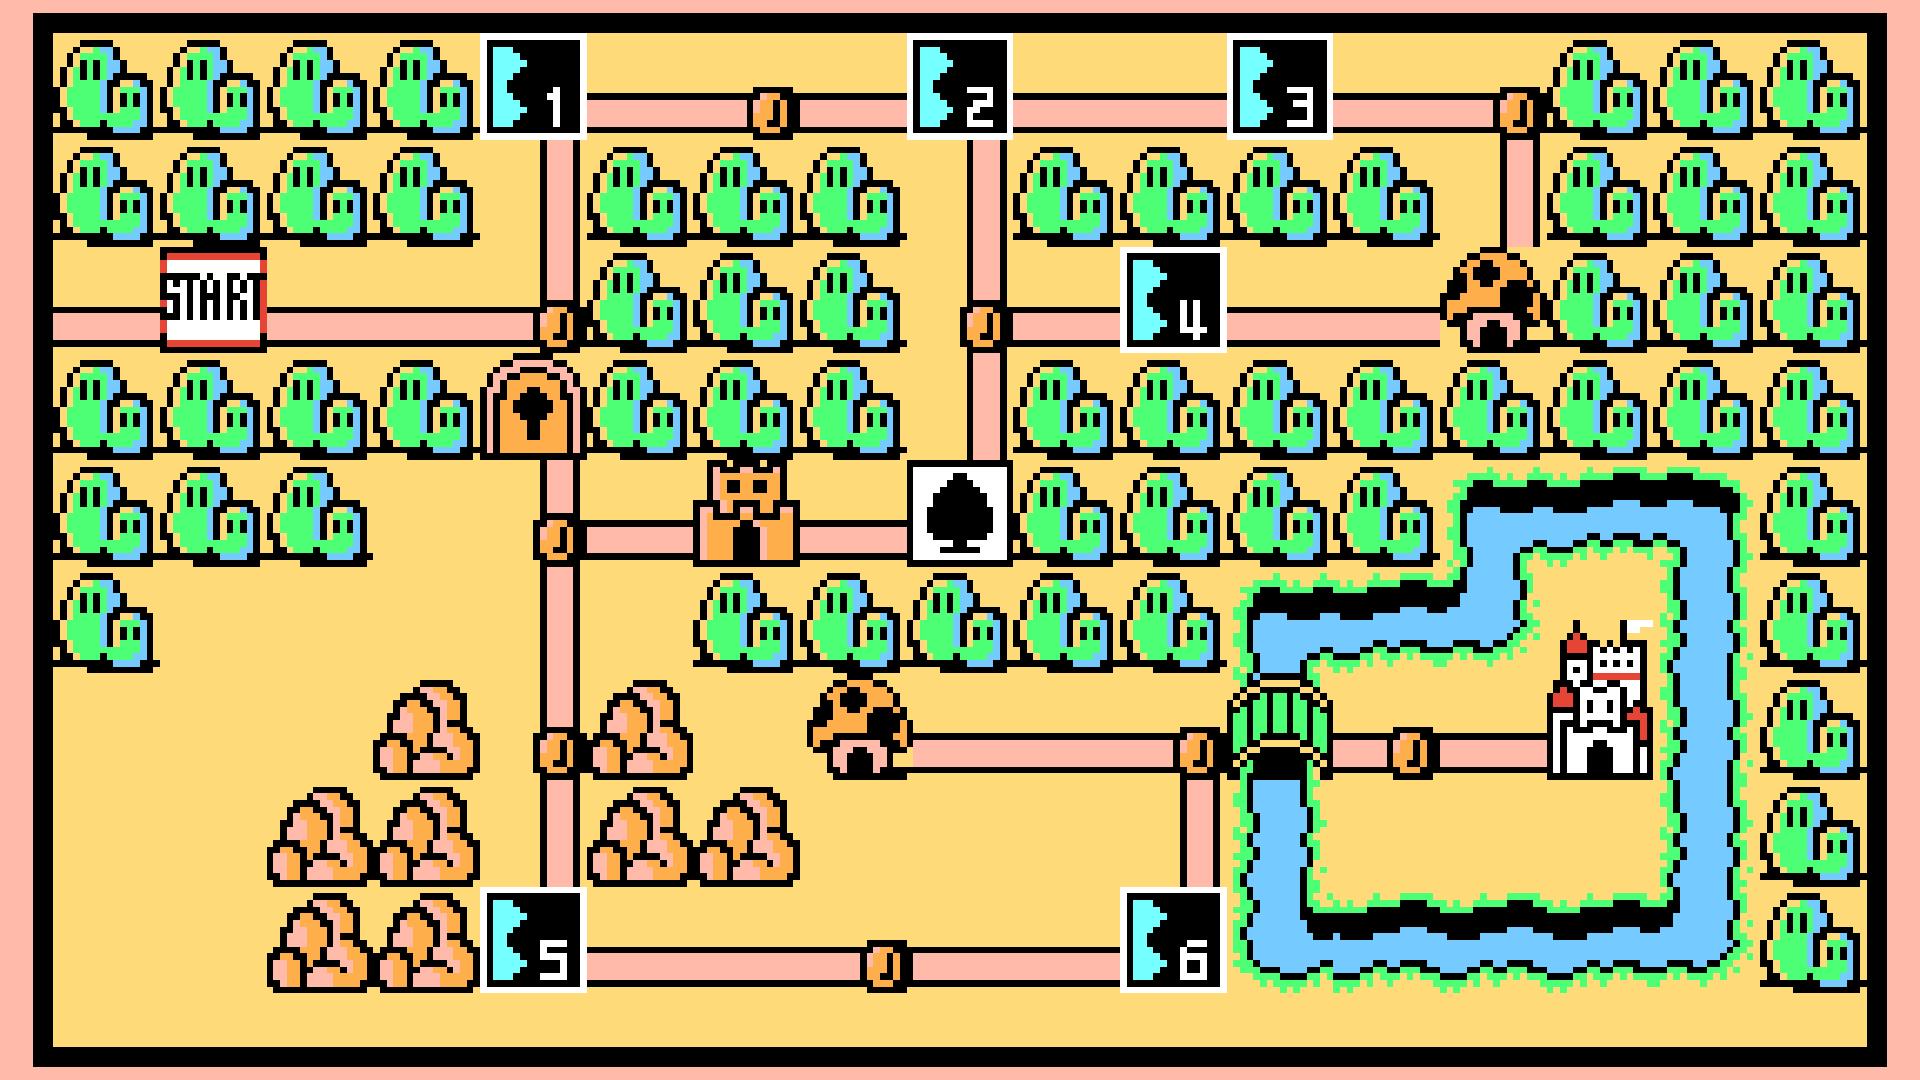 Most Viewed Super Mario Bros 3 Wallpapers 4k Wallpapers